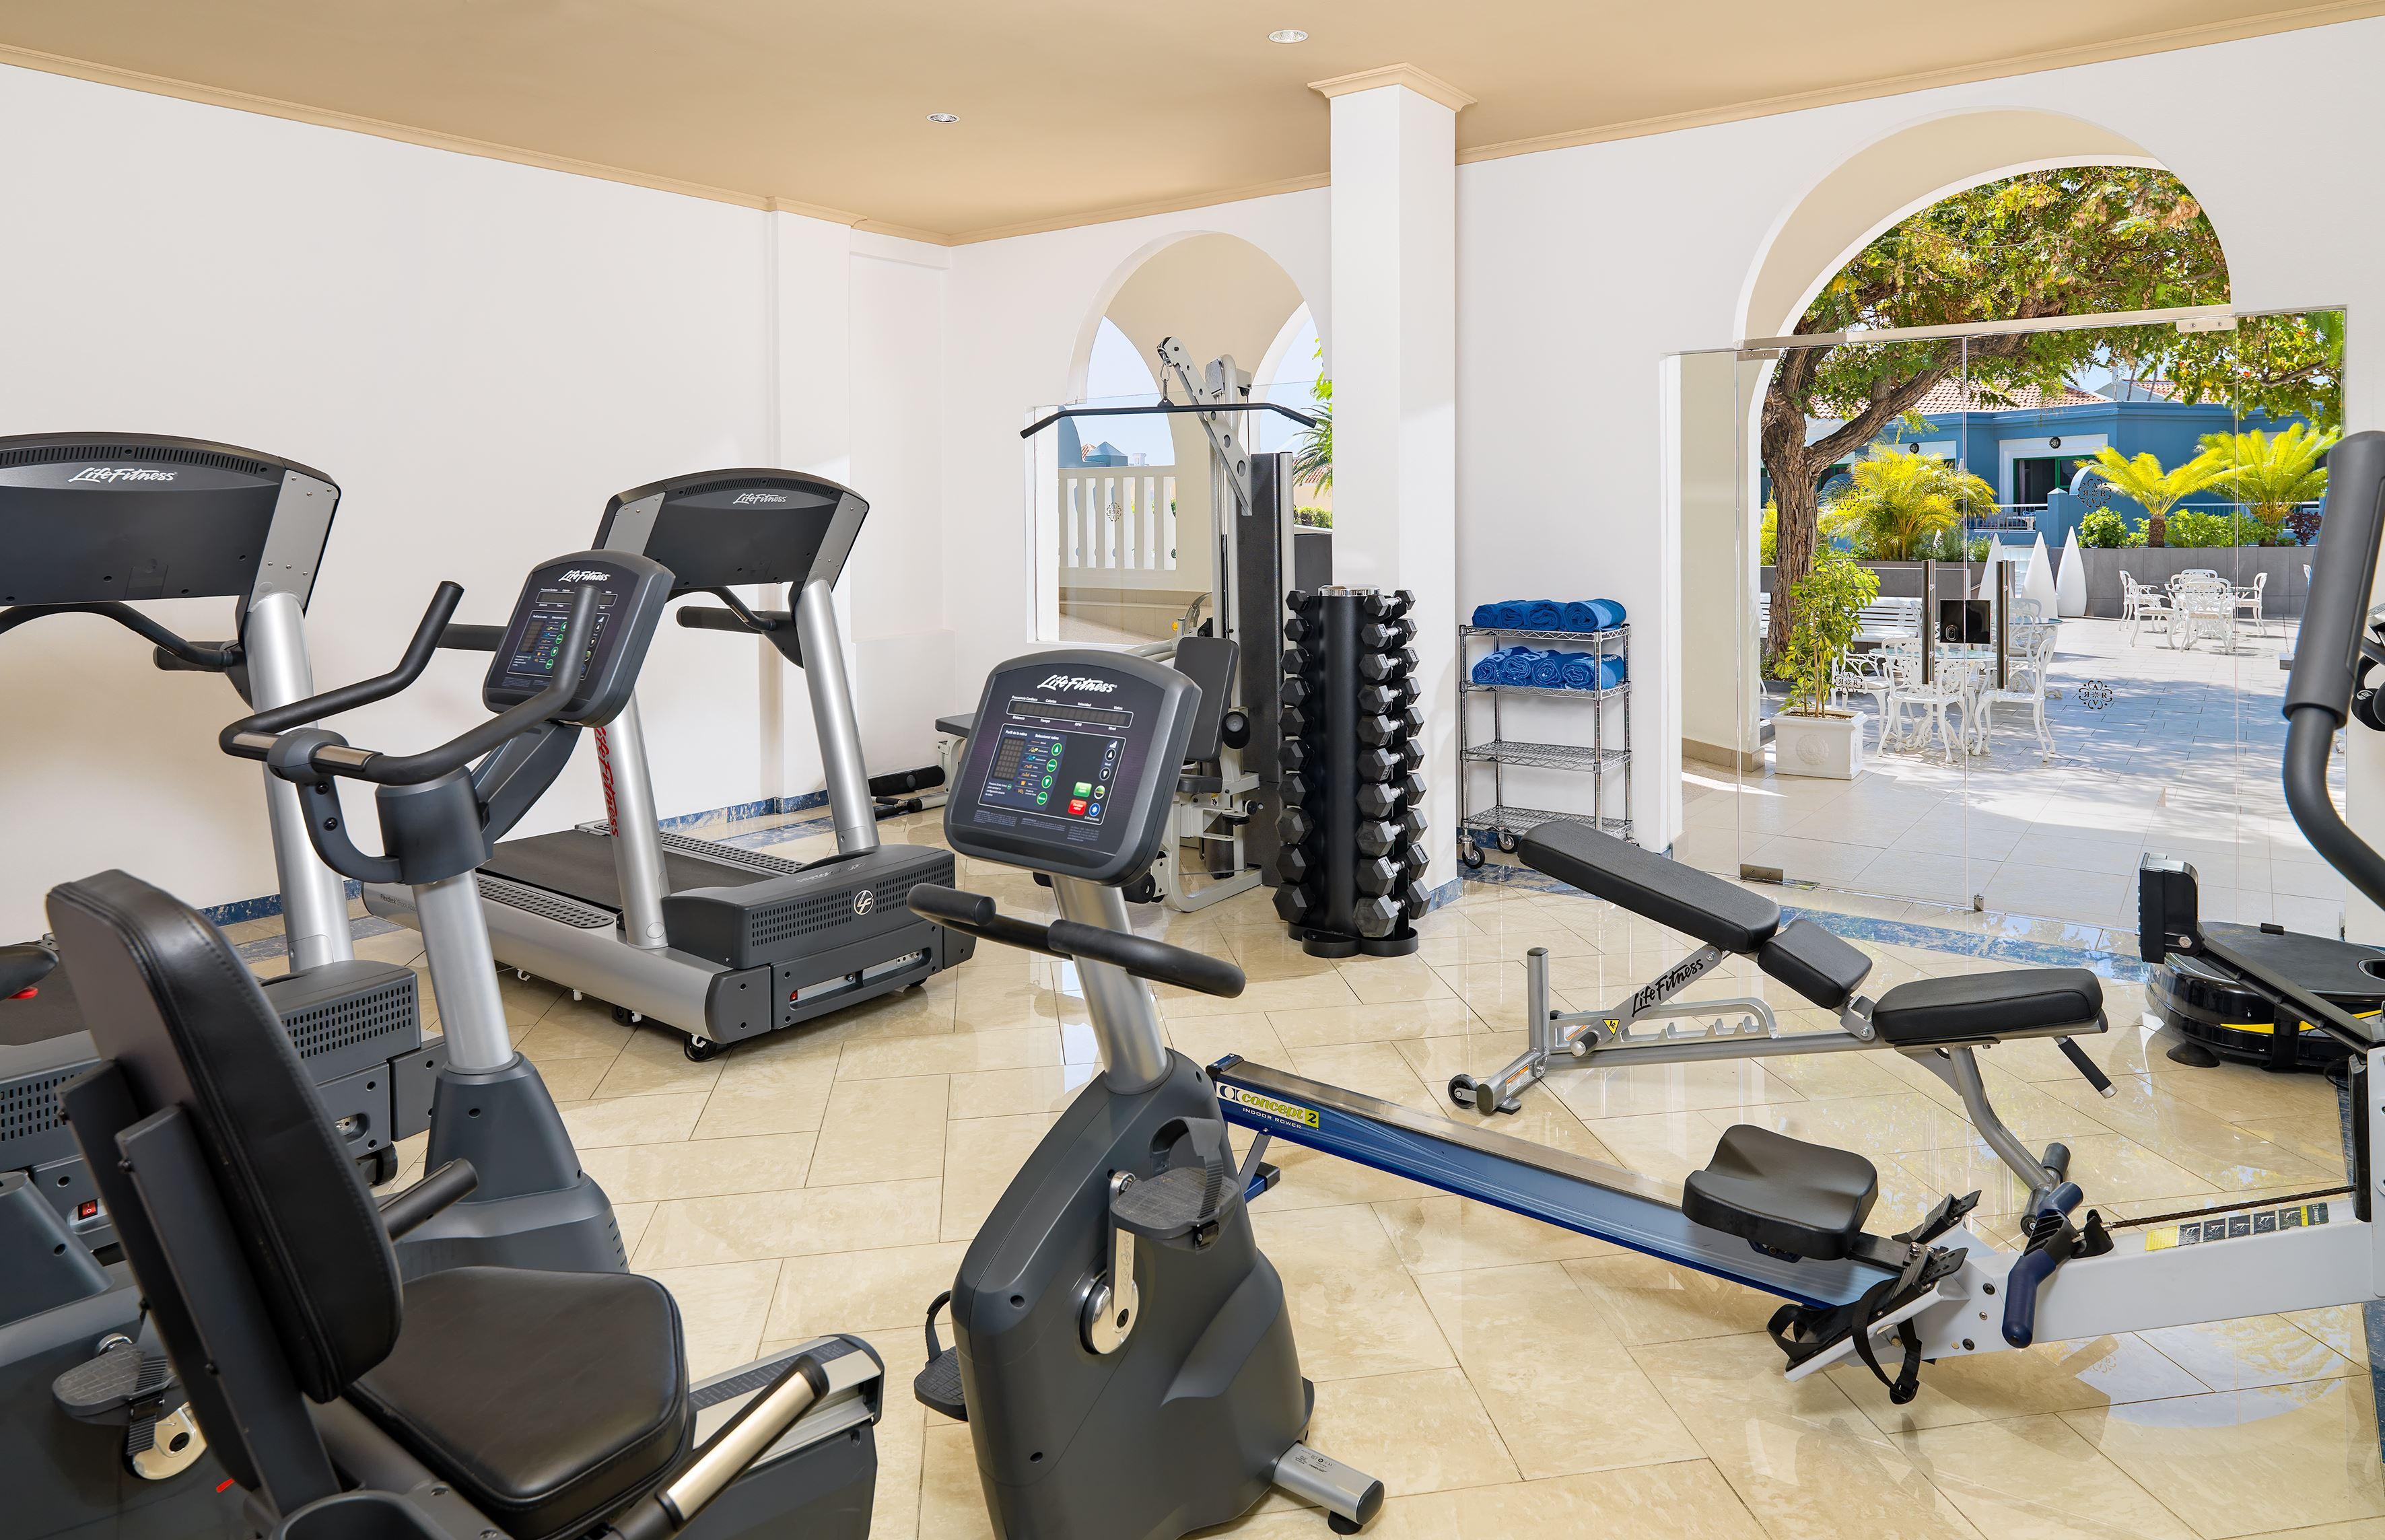 Gym på Hotell Colon Guanahany, Playa de las Americas Teneriffa